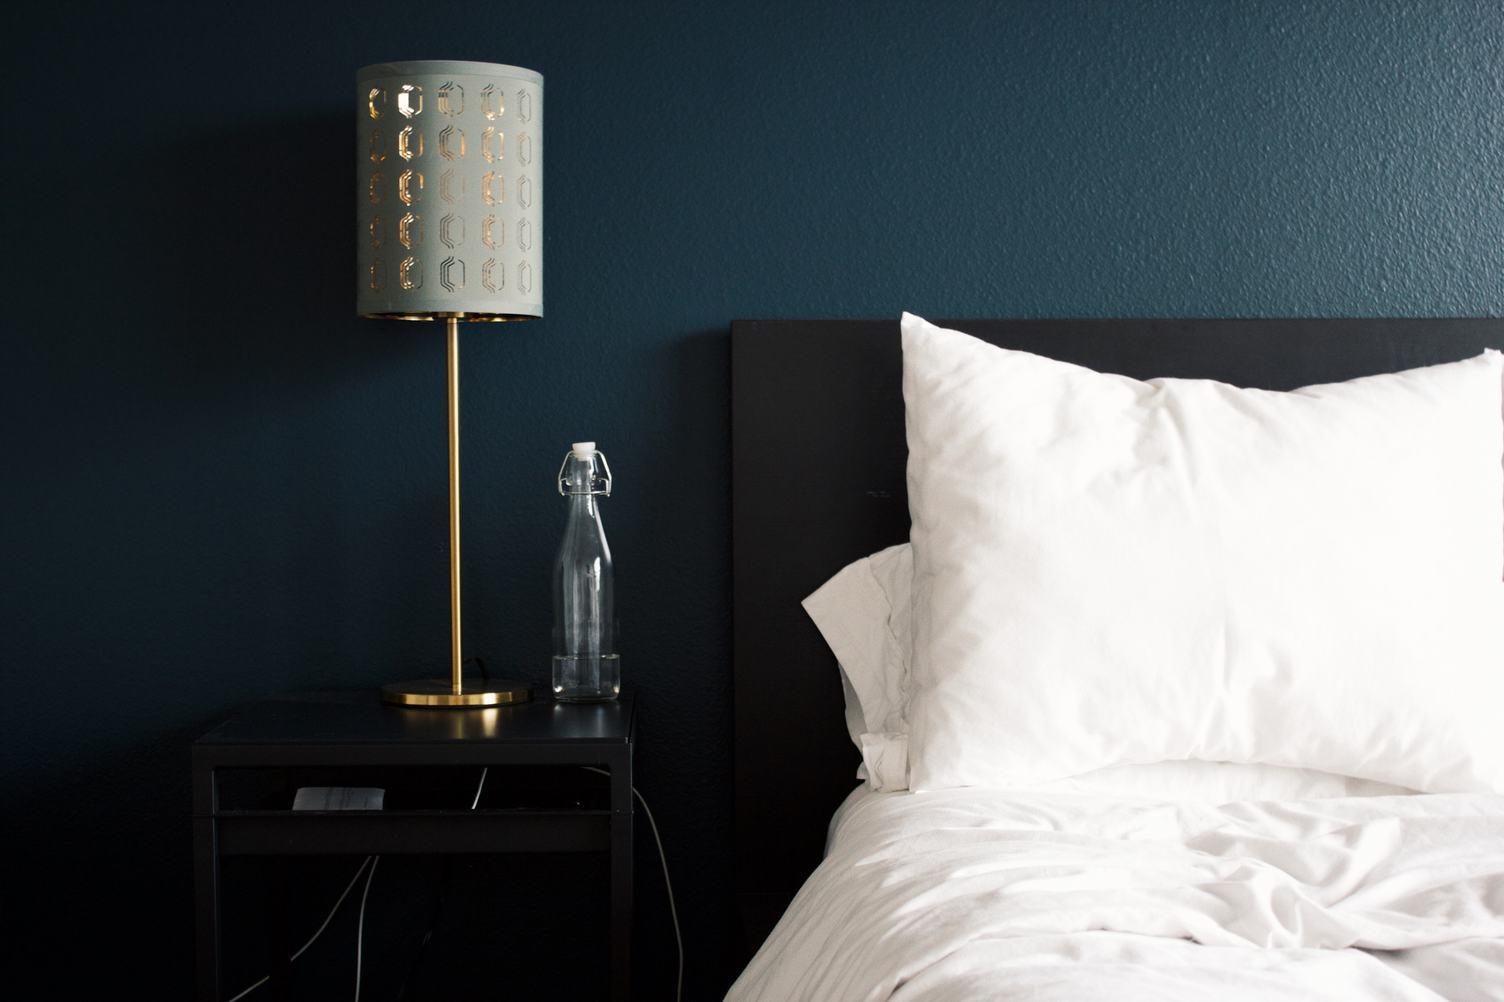 Crumpled White Bed Clothes in Dark Elegant Bedroom